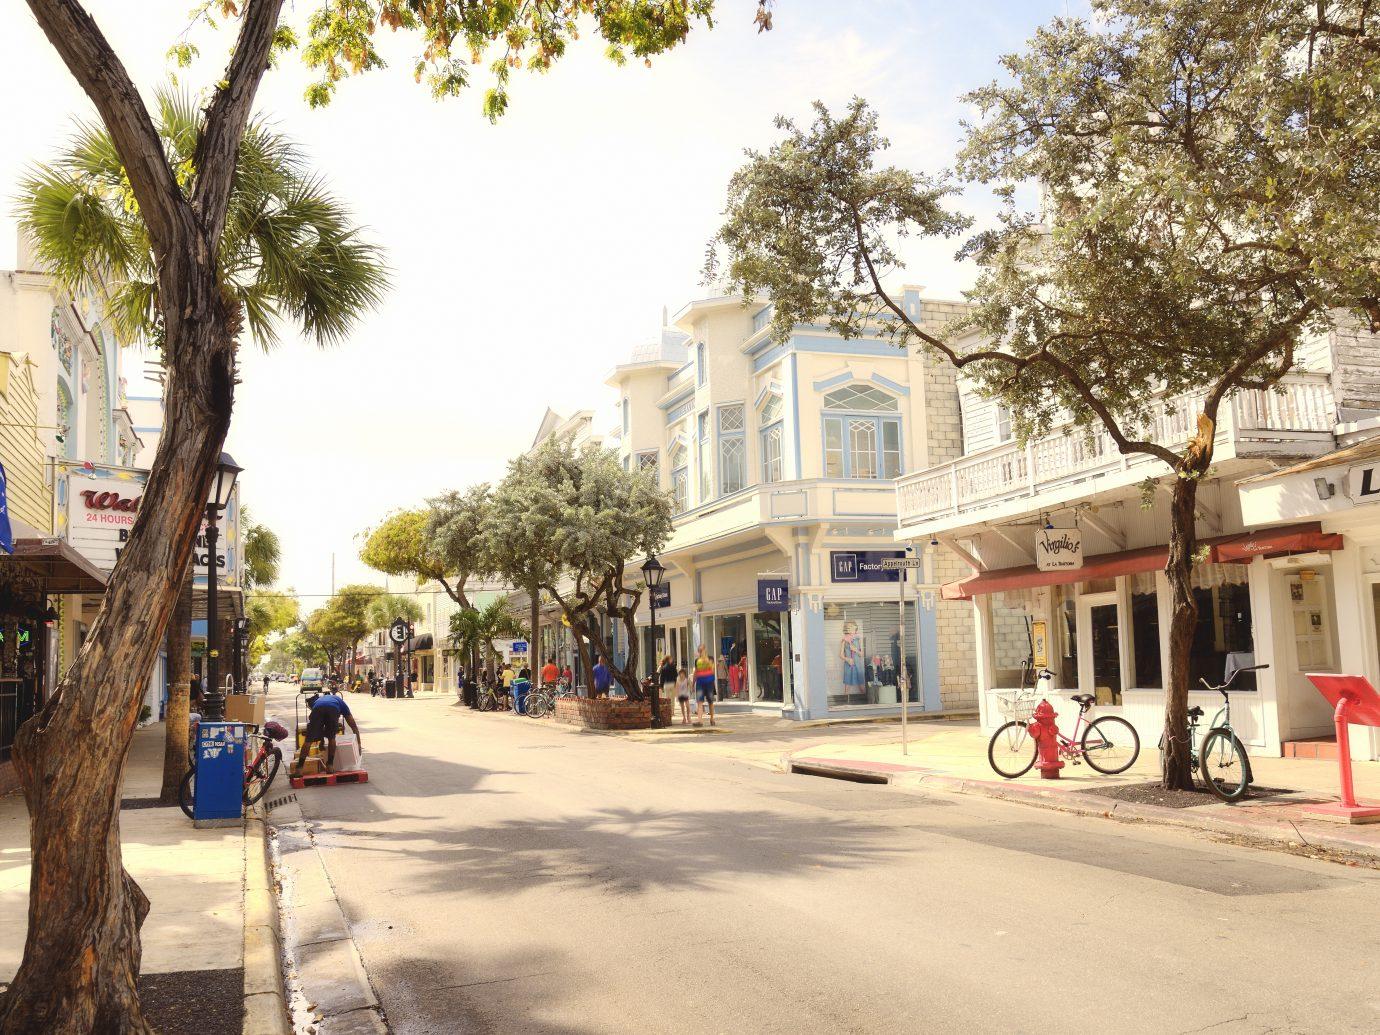 Duval street, Key West, Florida, USA.